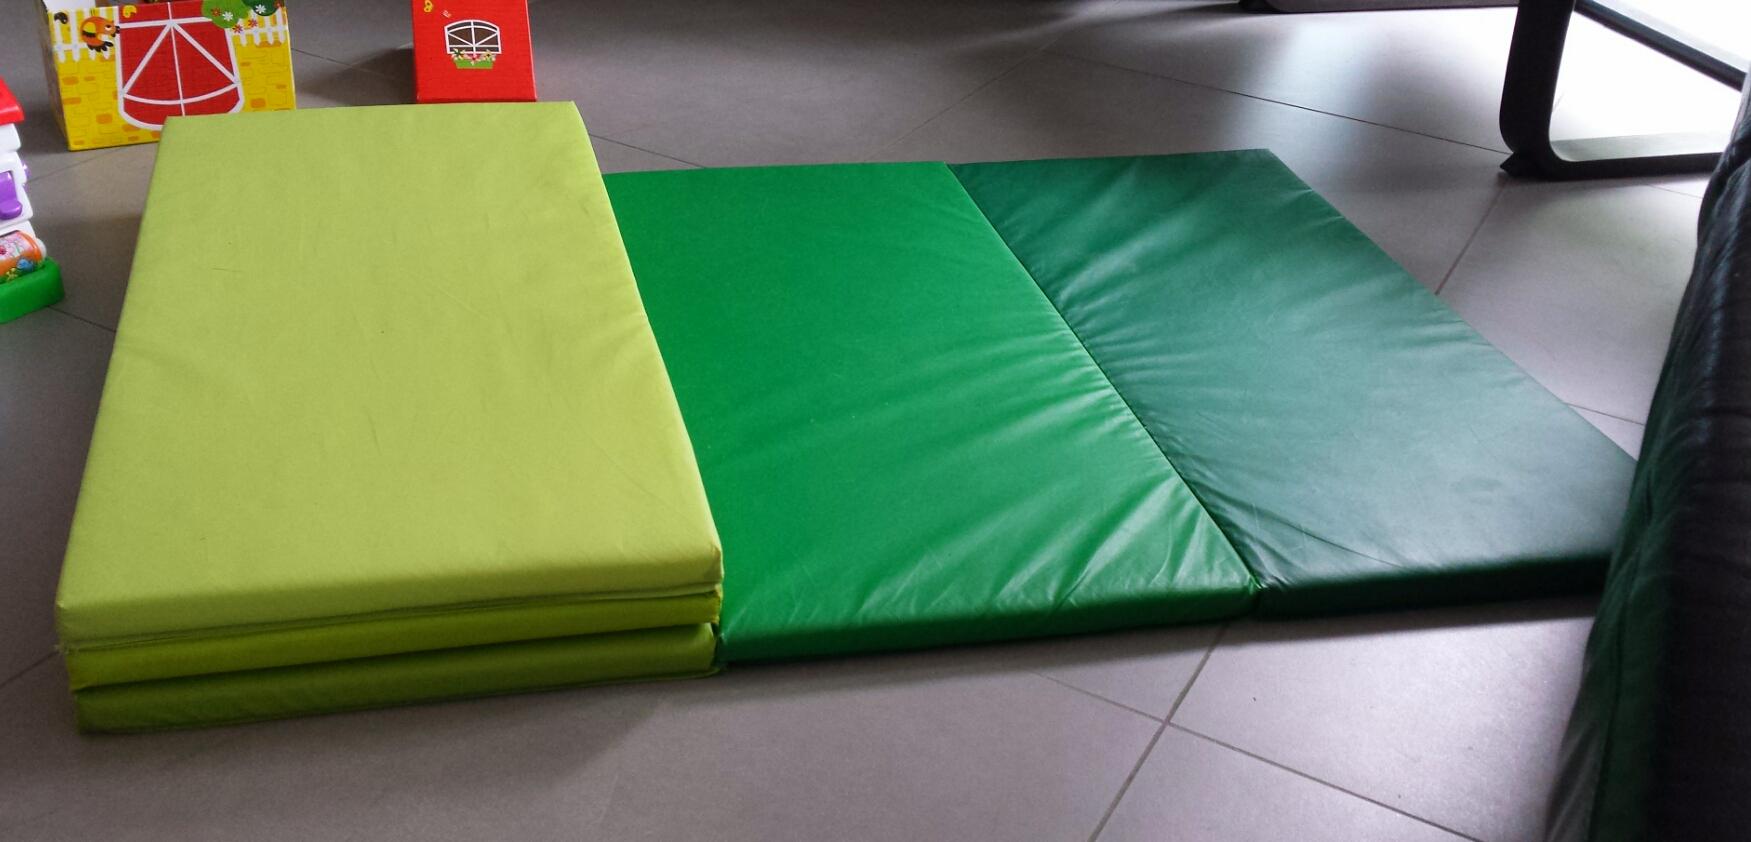 testing cascadeur en herbe deroulons le tapis deddy and co